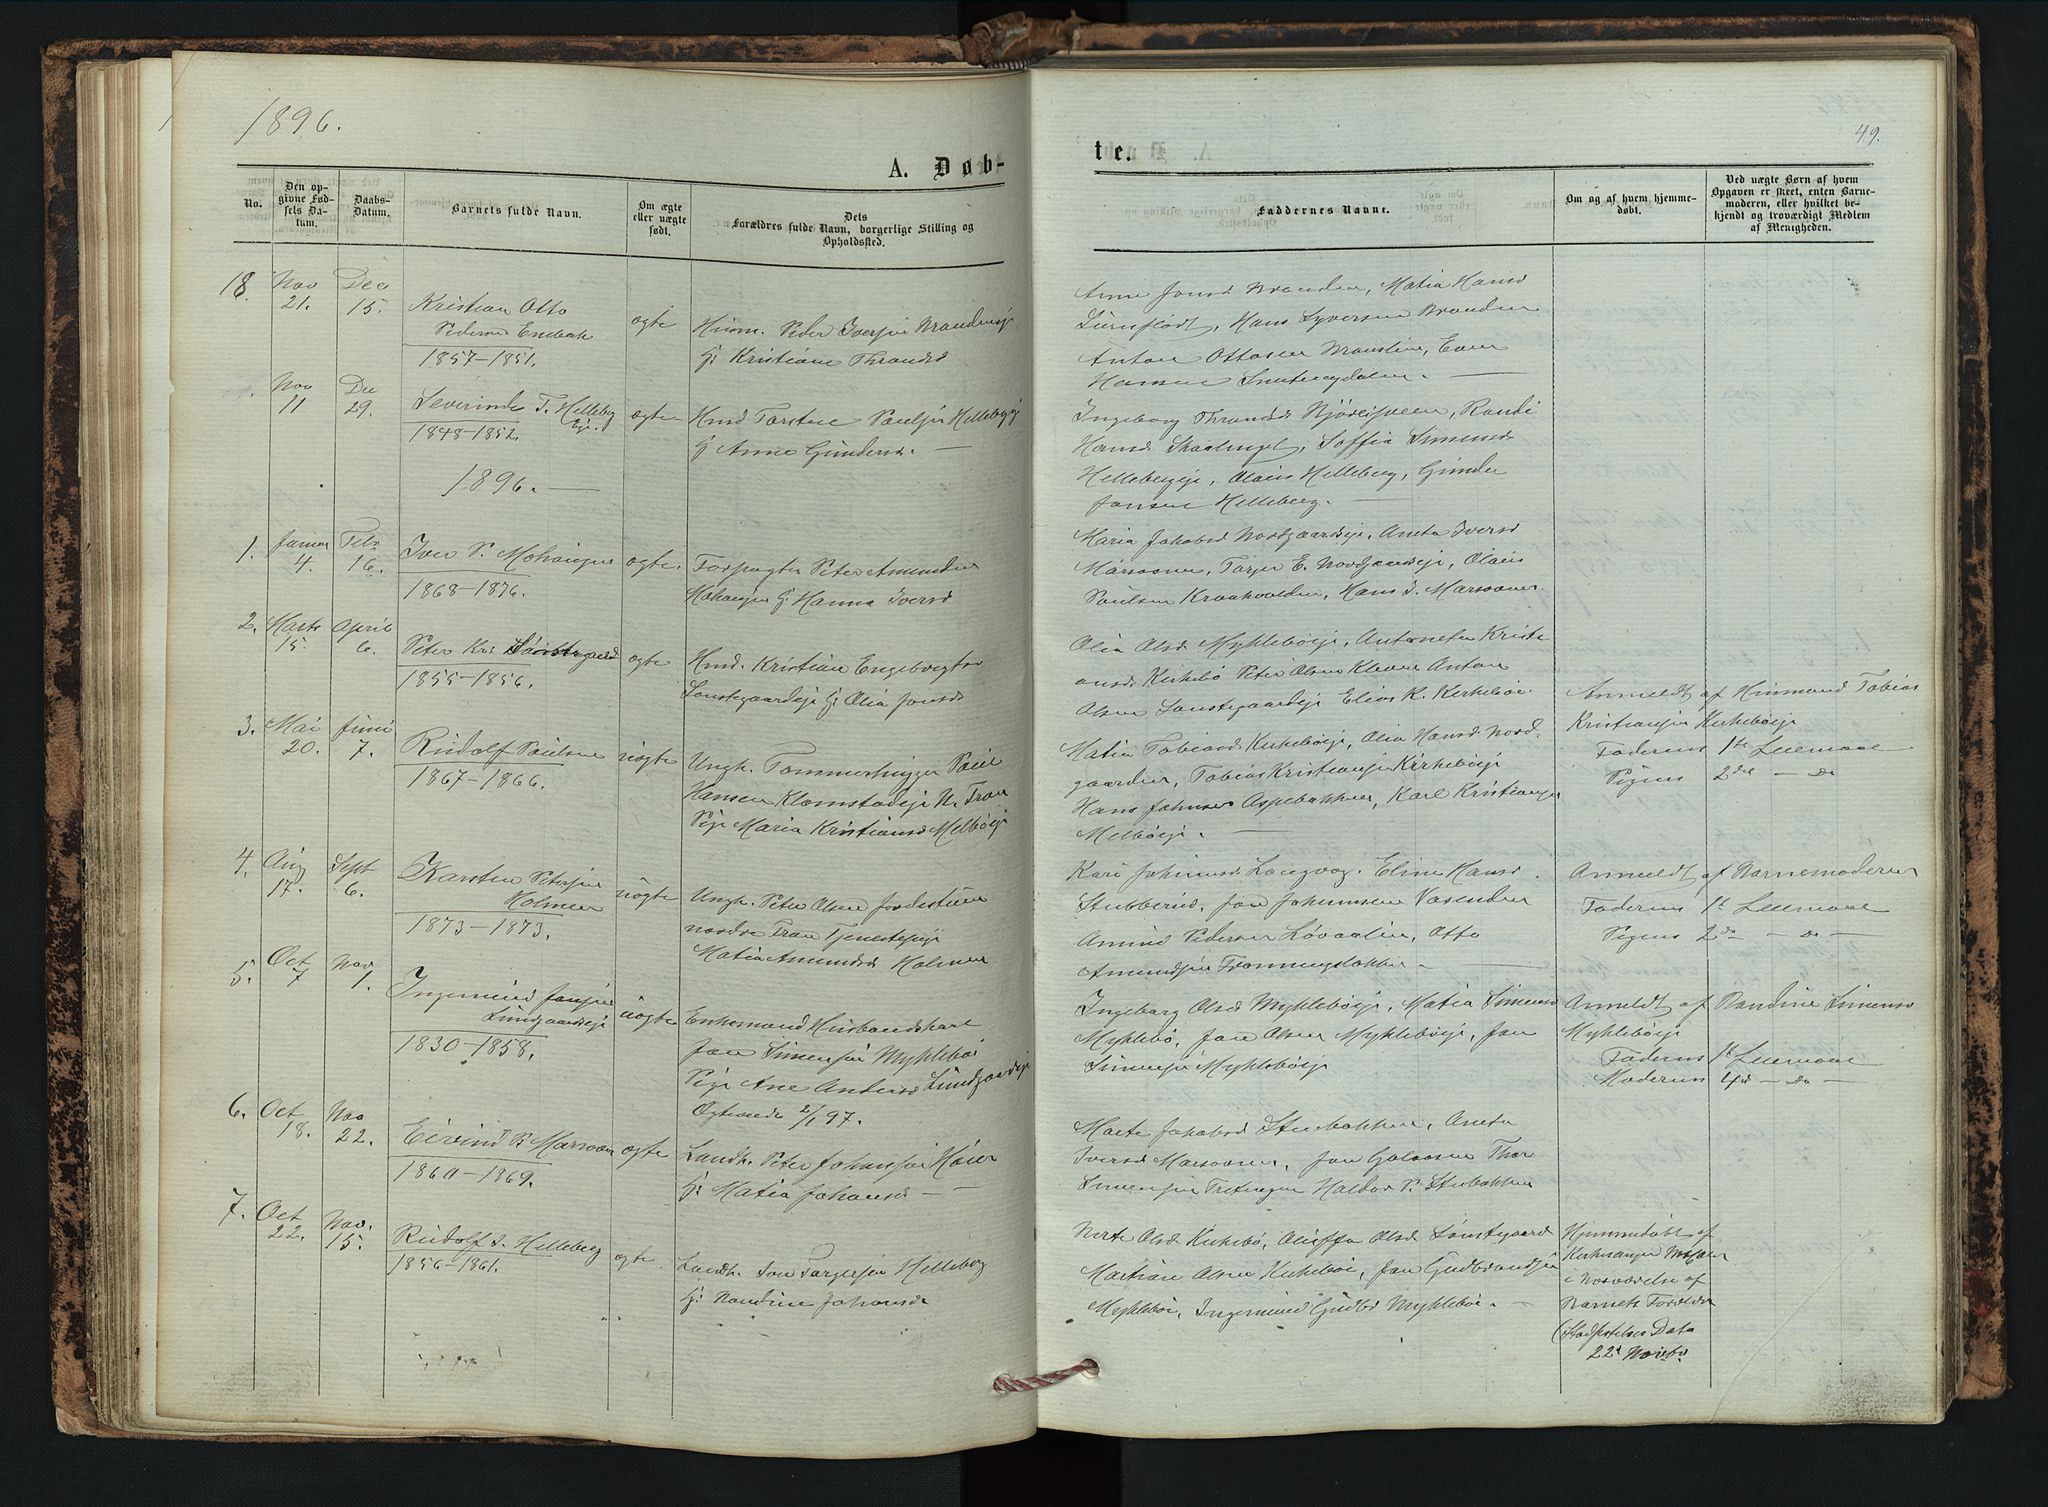 SAH, Vestre Gausdal prestekontor, Klokkerbok nr. 2, 1874-1897, s. 49